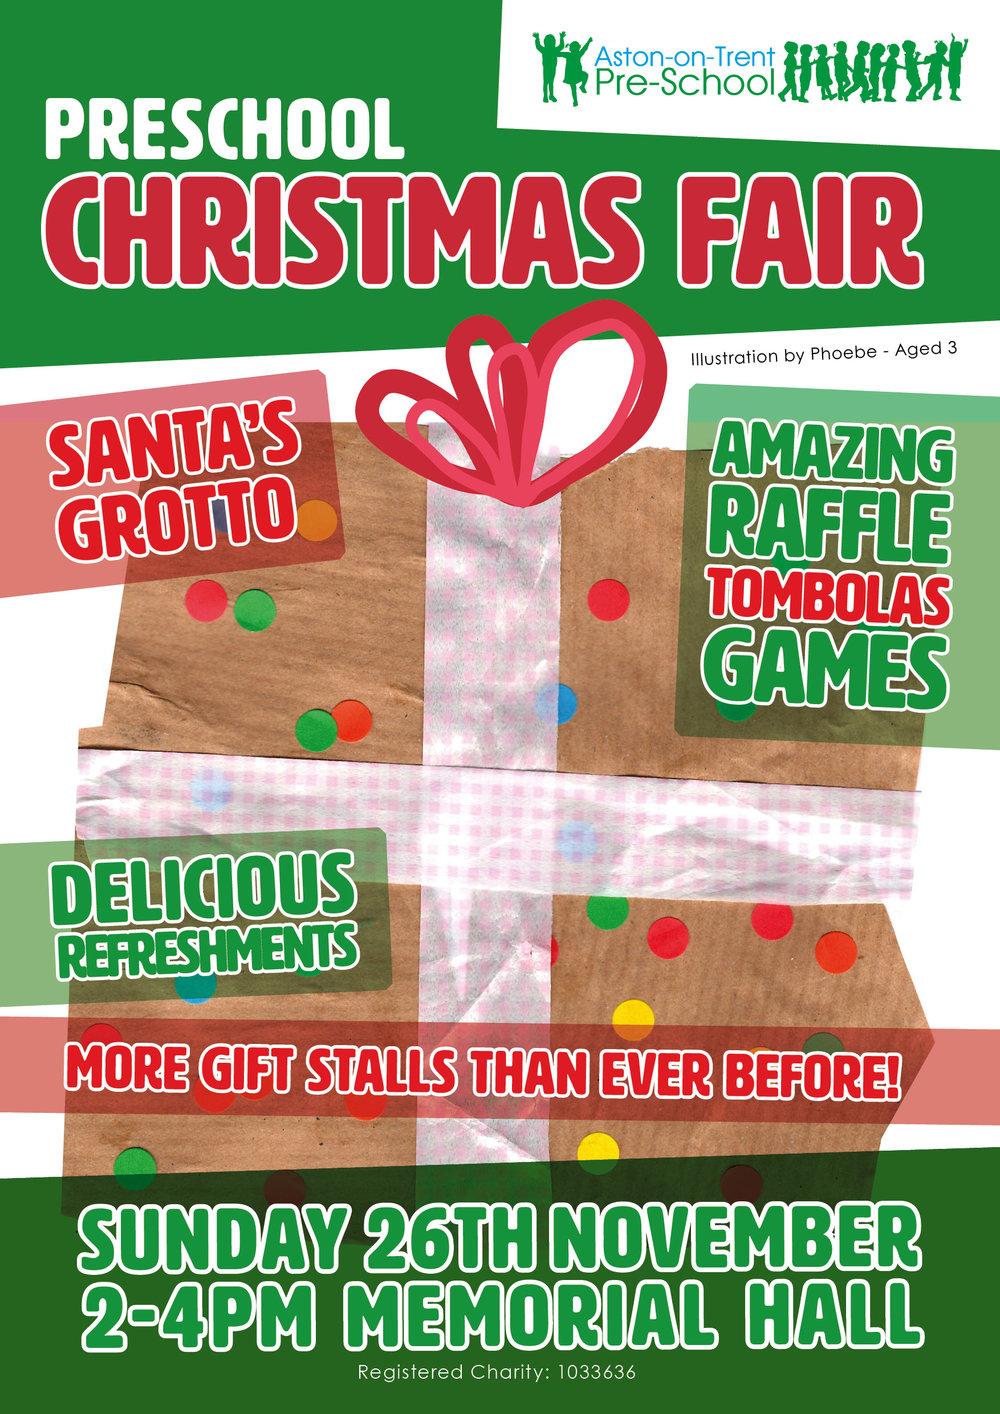 Preschool Christmas Fair Poster 2017 WEB.jpg